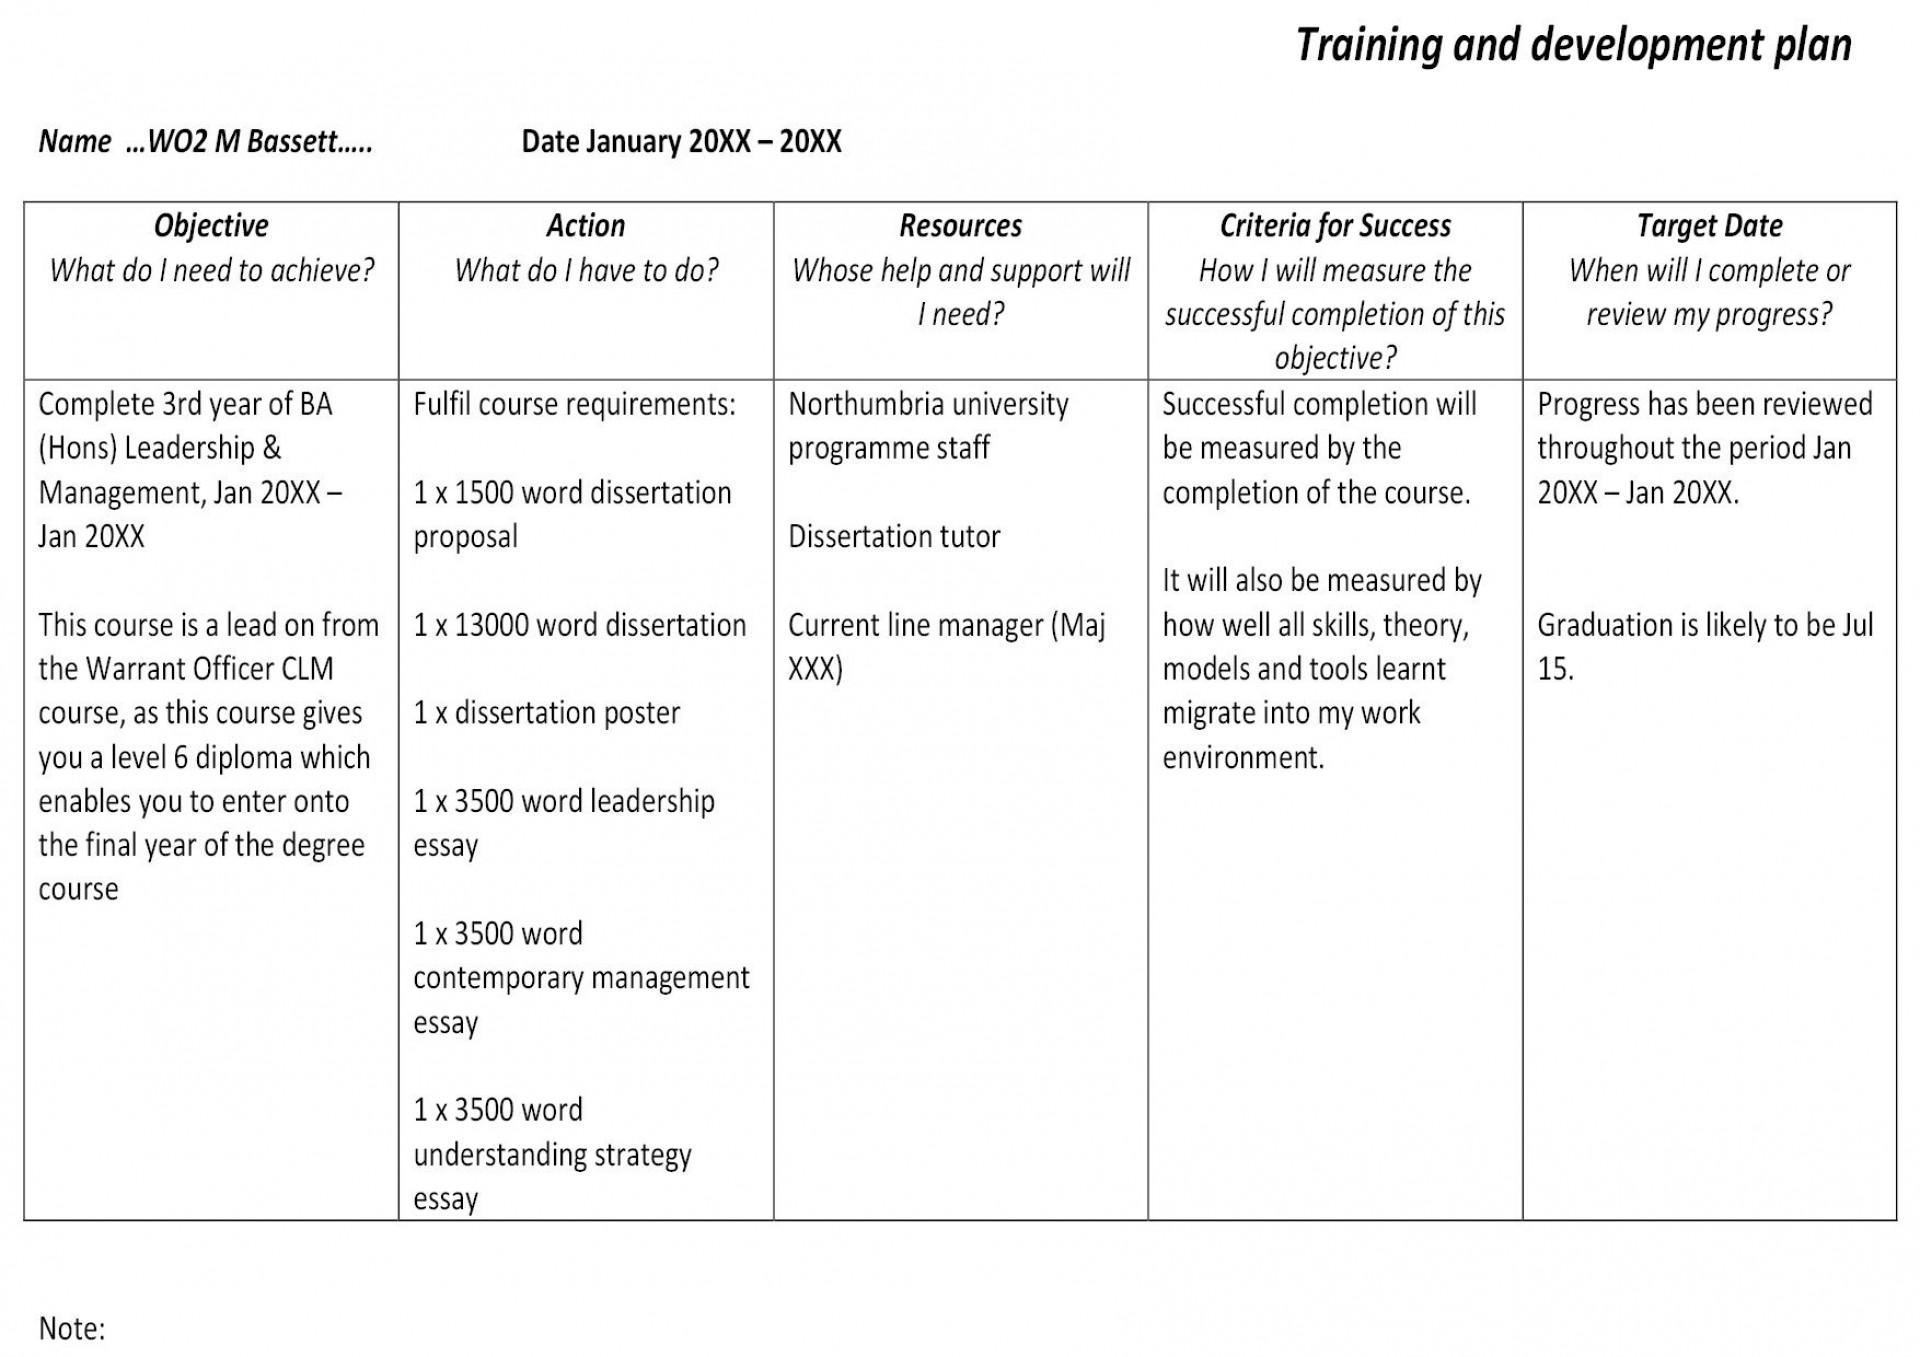 009 Shocking Professional Development Plan Template For Nurse Design  Nurses Sample Goal Example1920